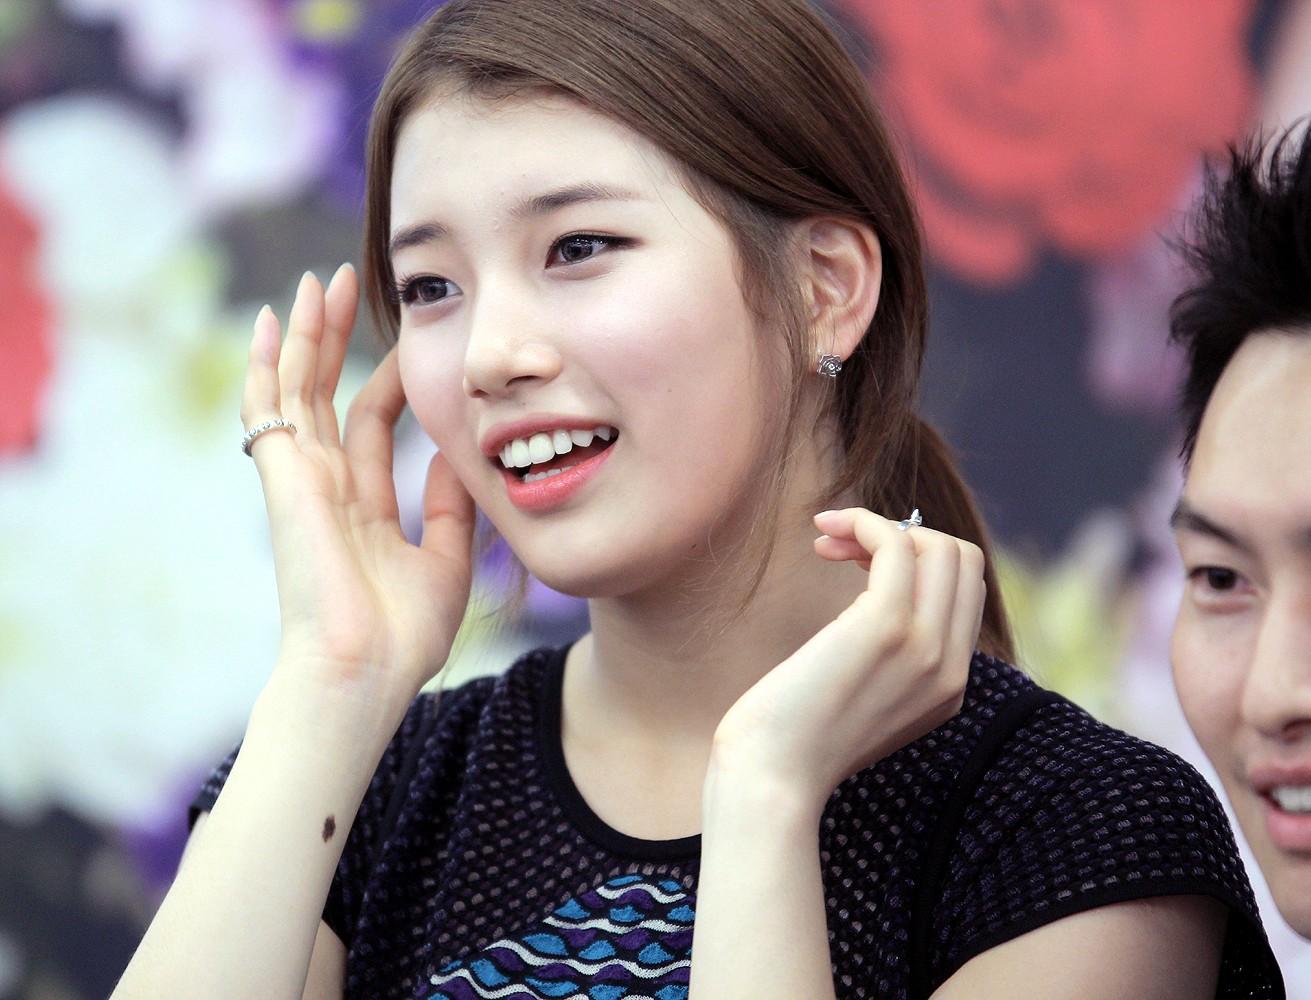 Yoona lee min ho dating who 7